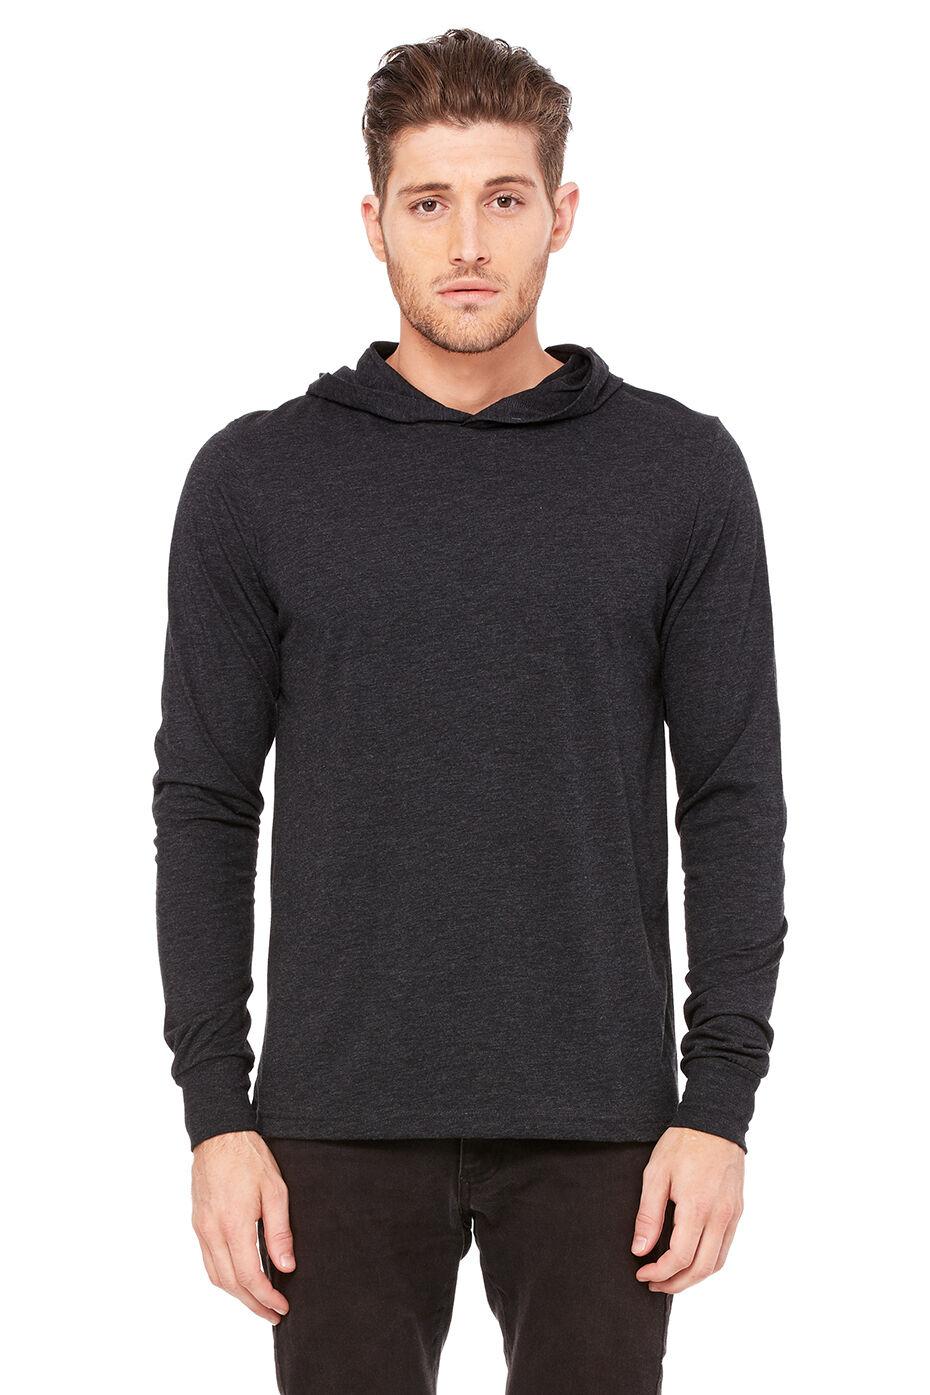 Black t shirt hoodie - Click To Enlarge